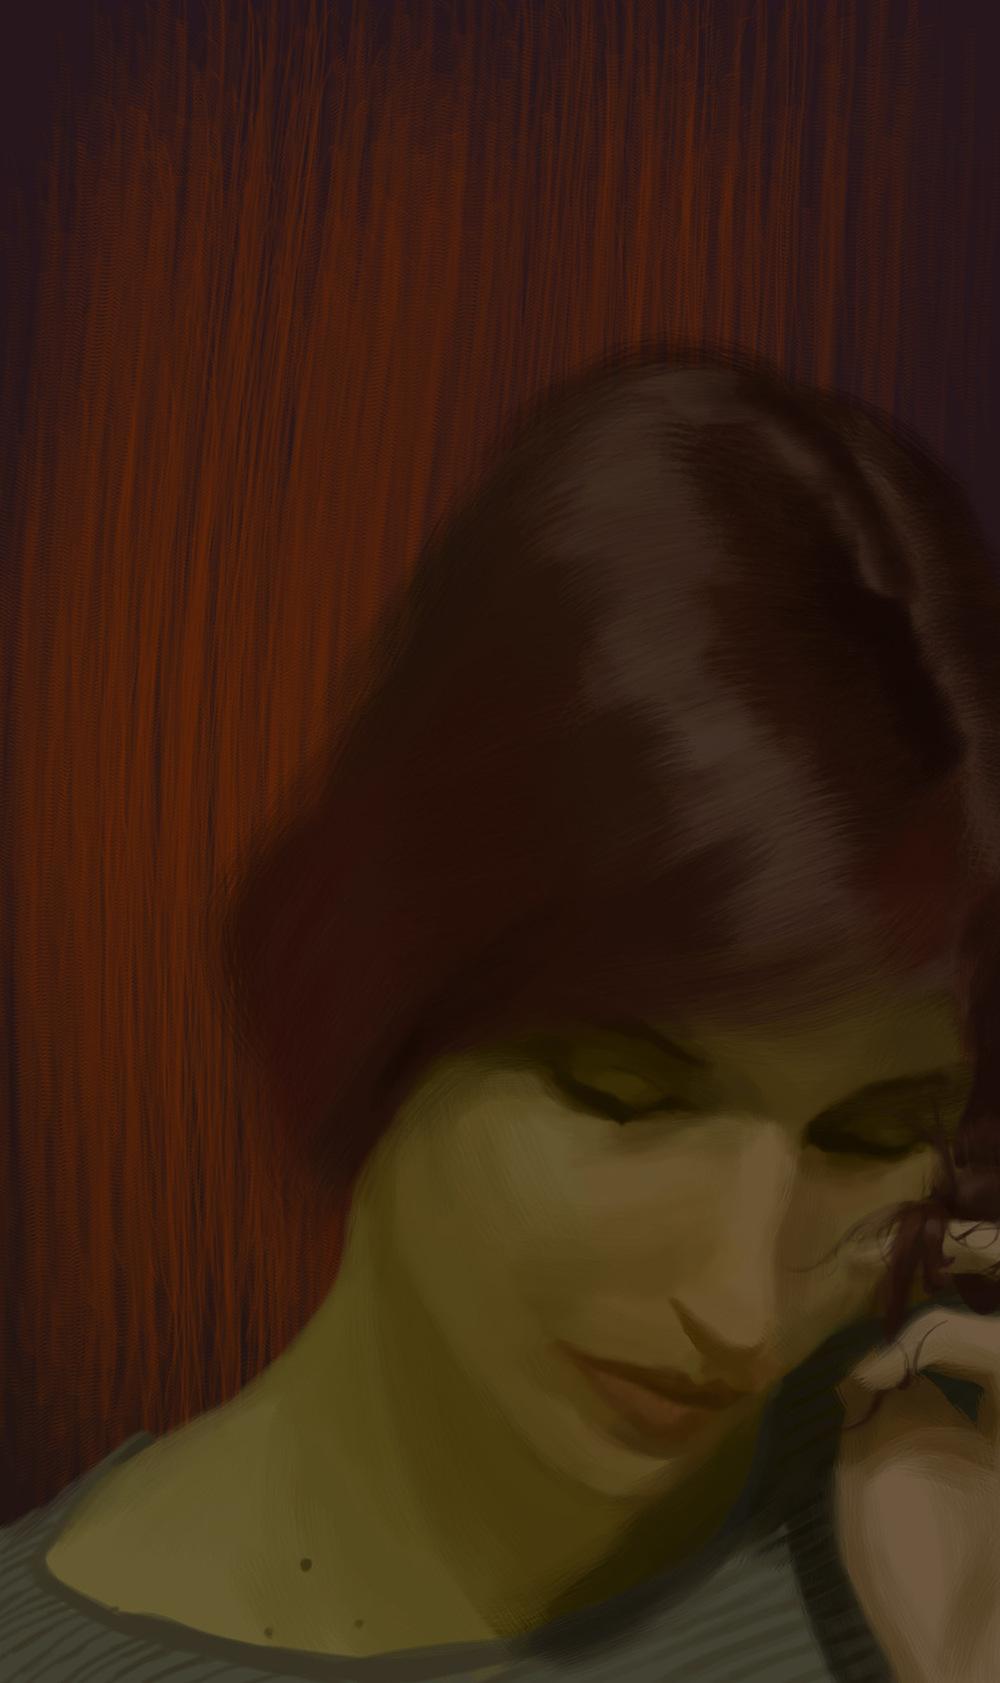 myPortfolio - Joanne - color variation